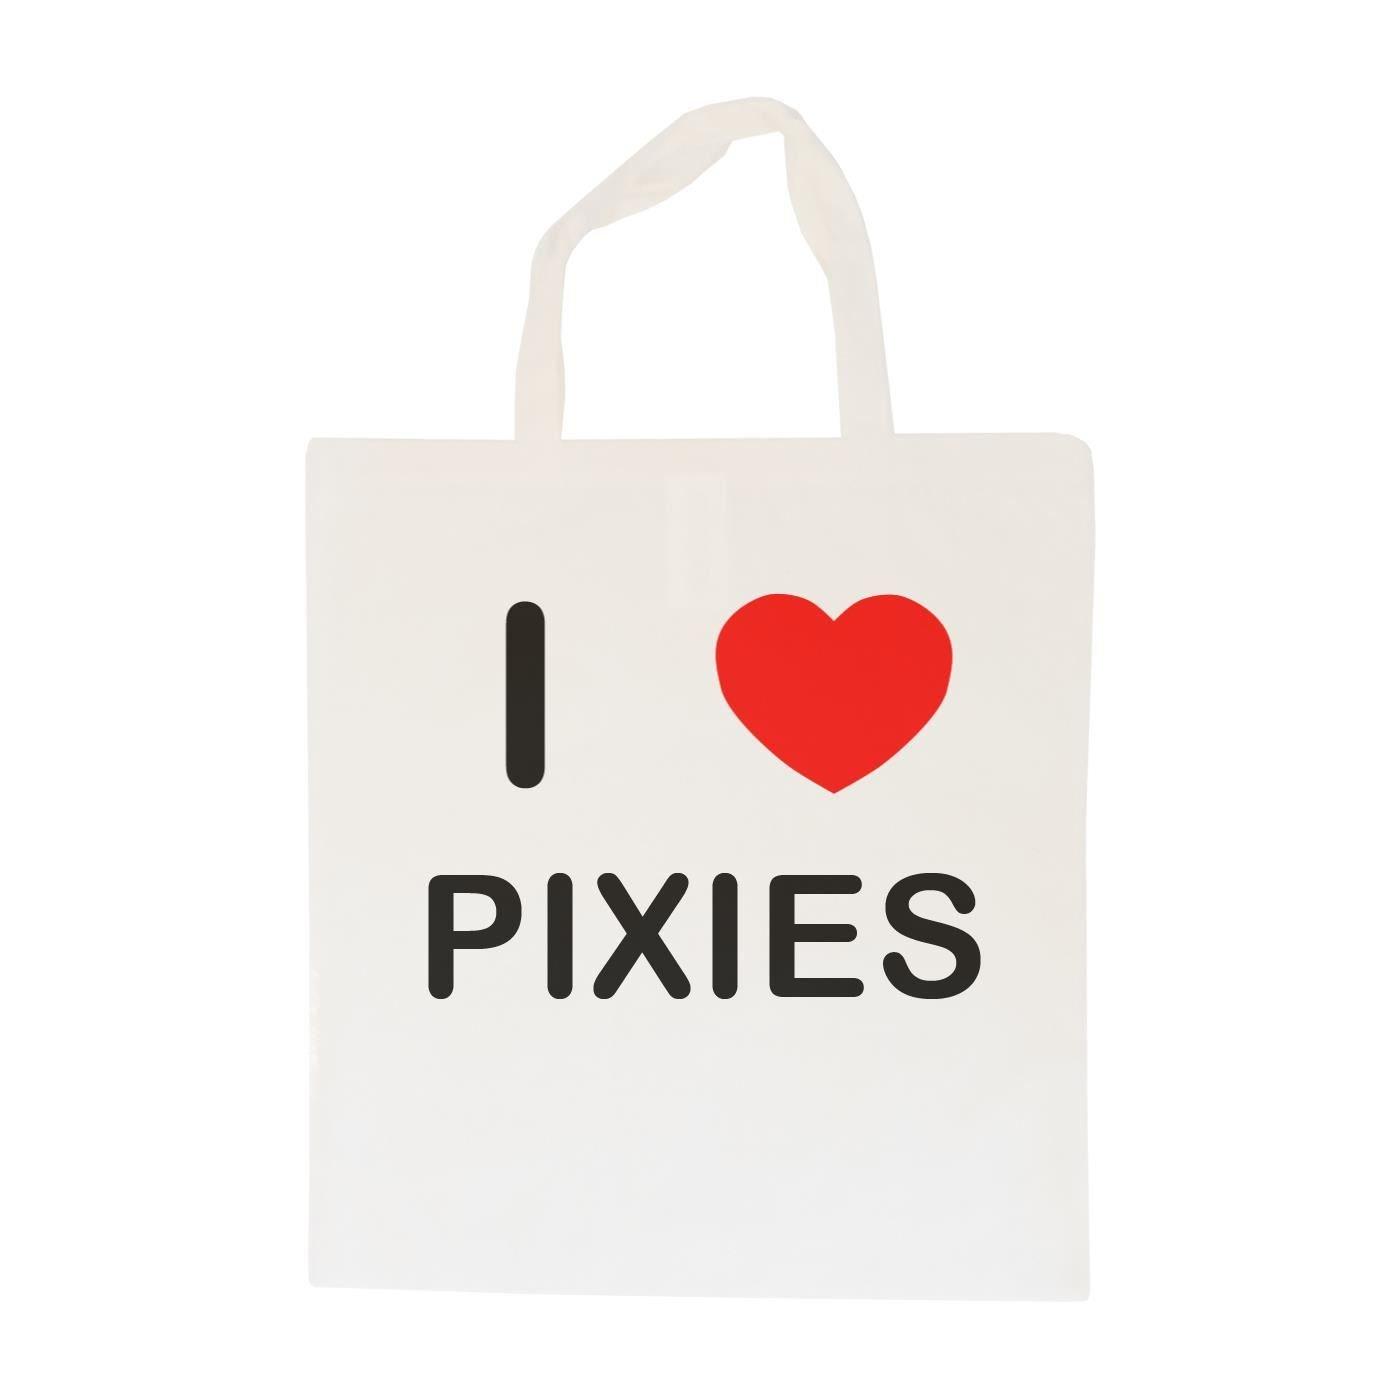 I Love Pixies Cotton Tote Bag